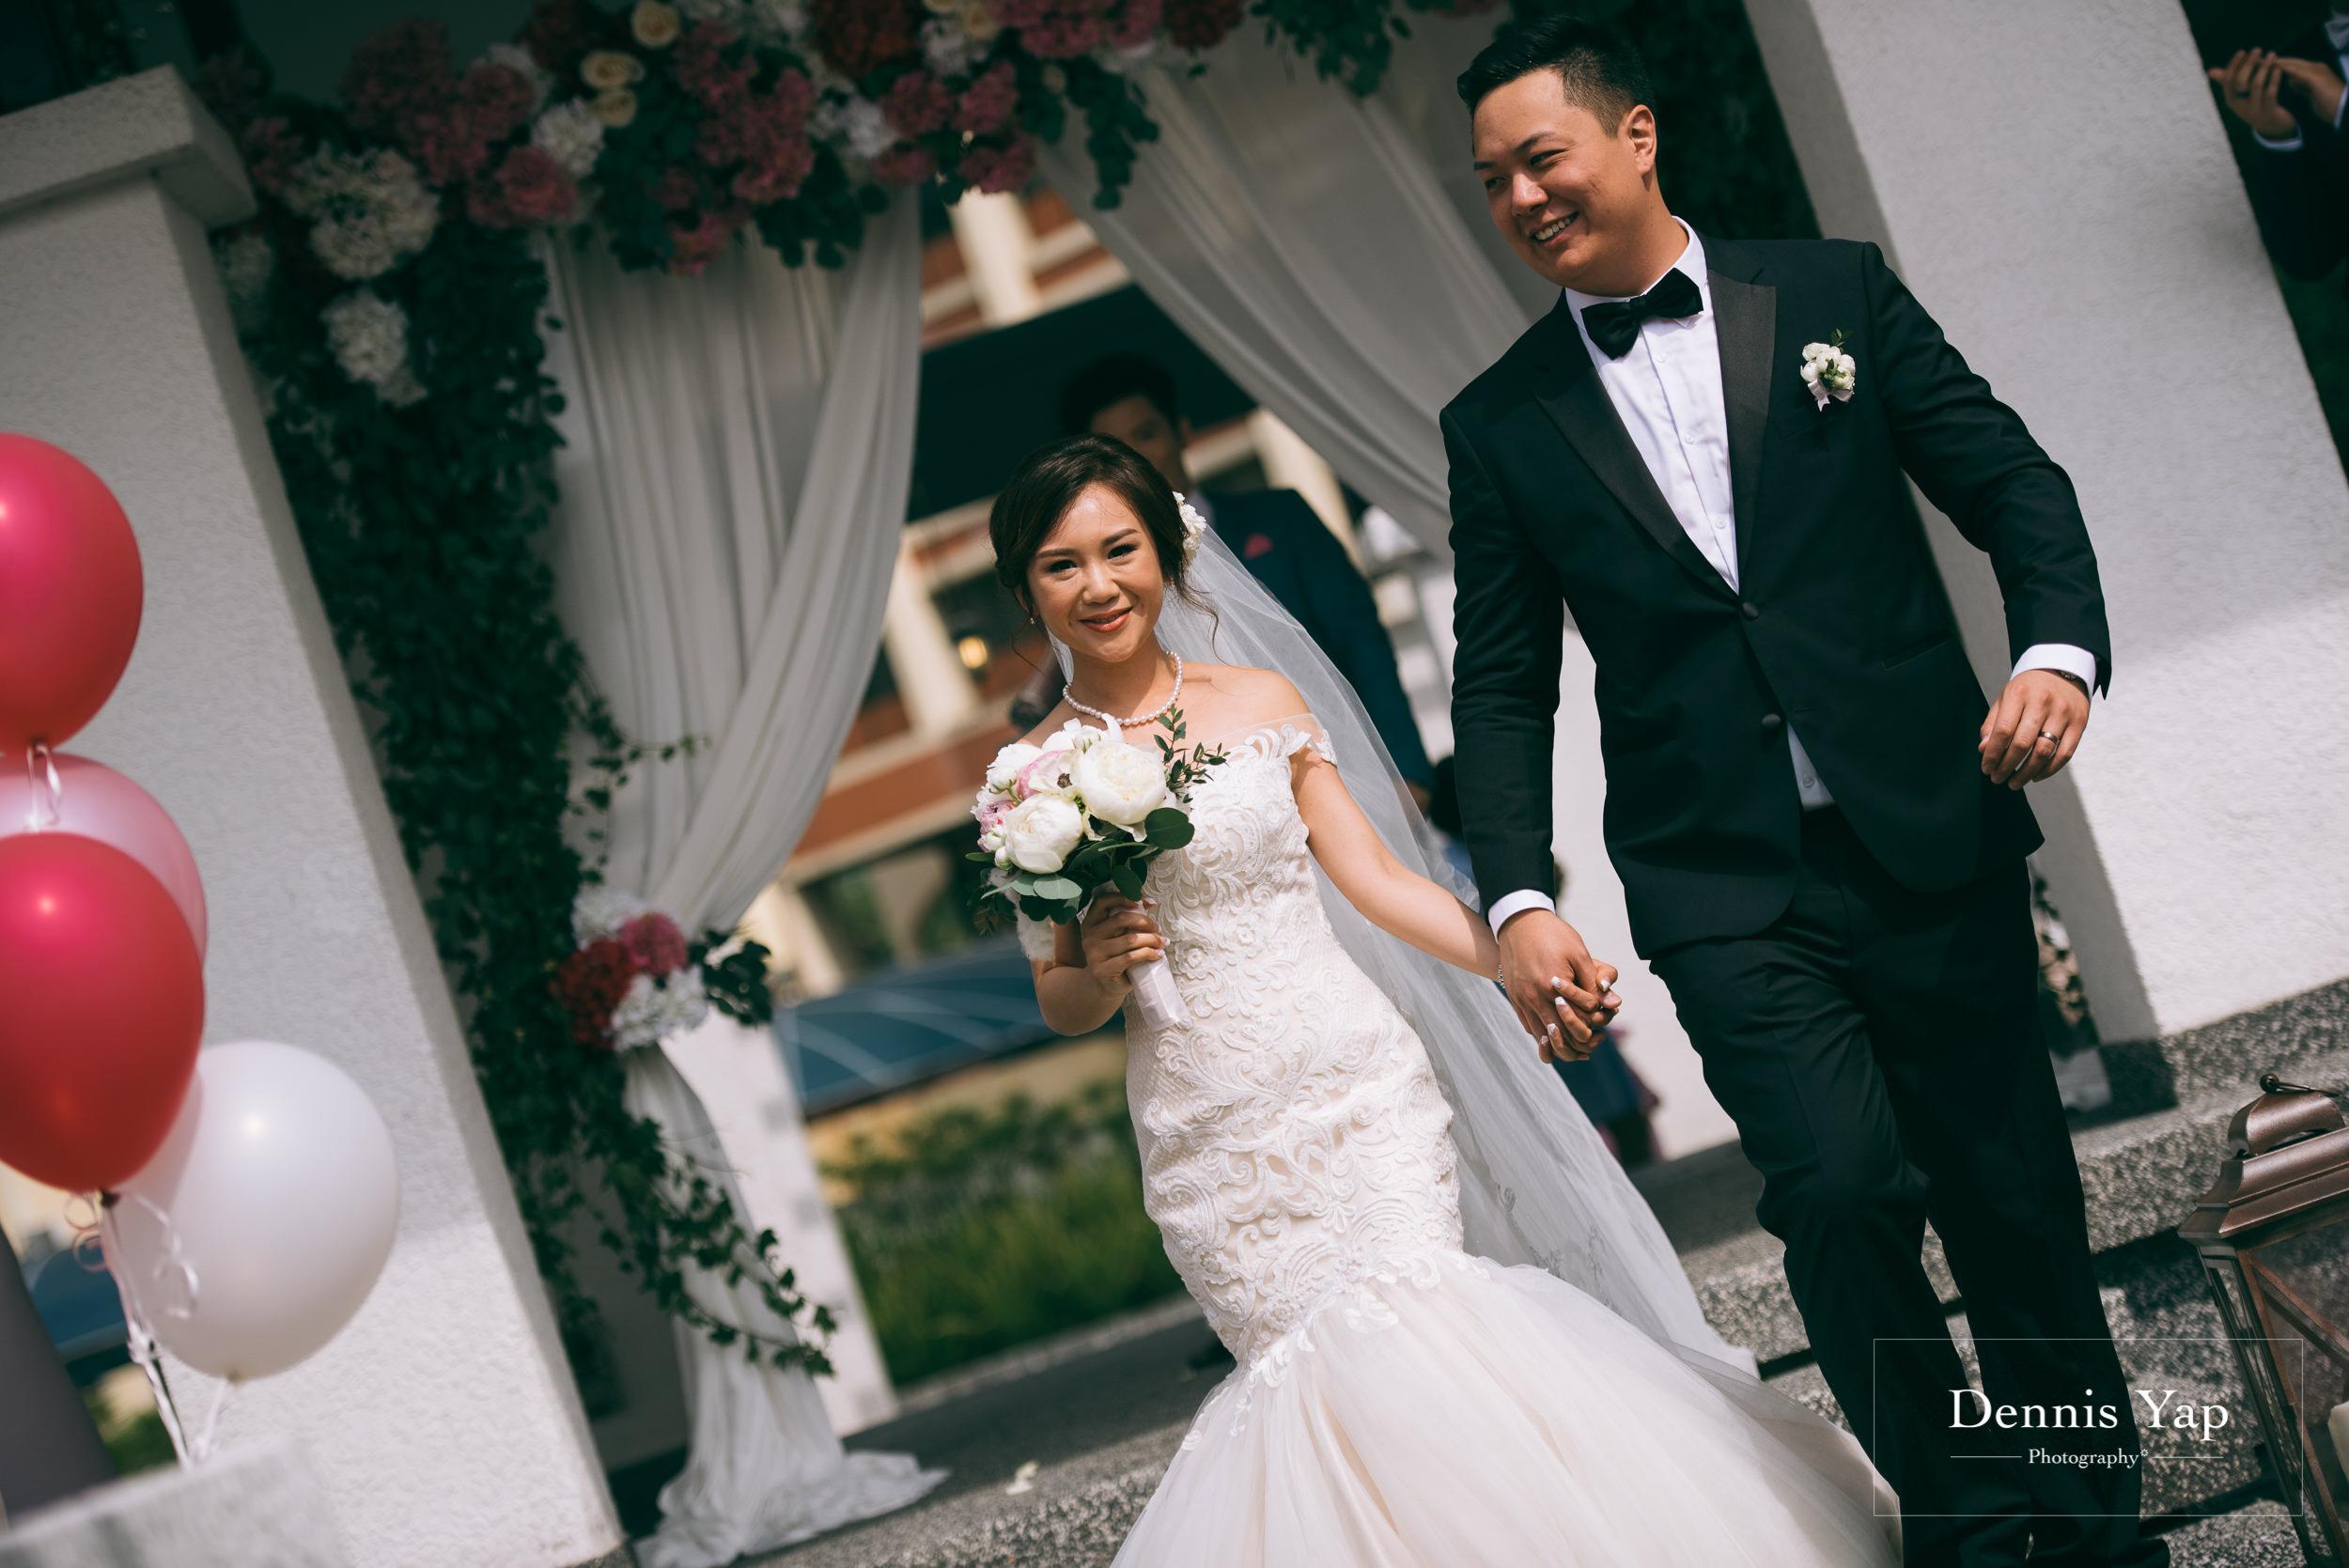 lionel joanne garden wedding majestic hotel dennis yap photography malaysia top wedding photographer-51.jpg